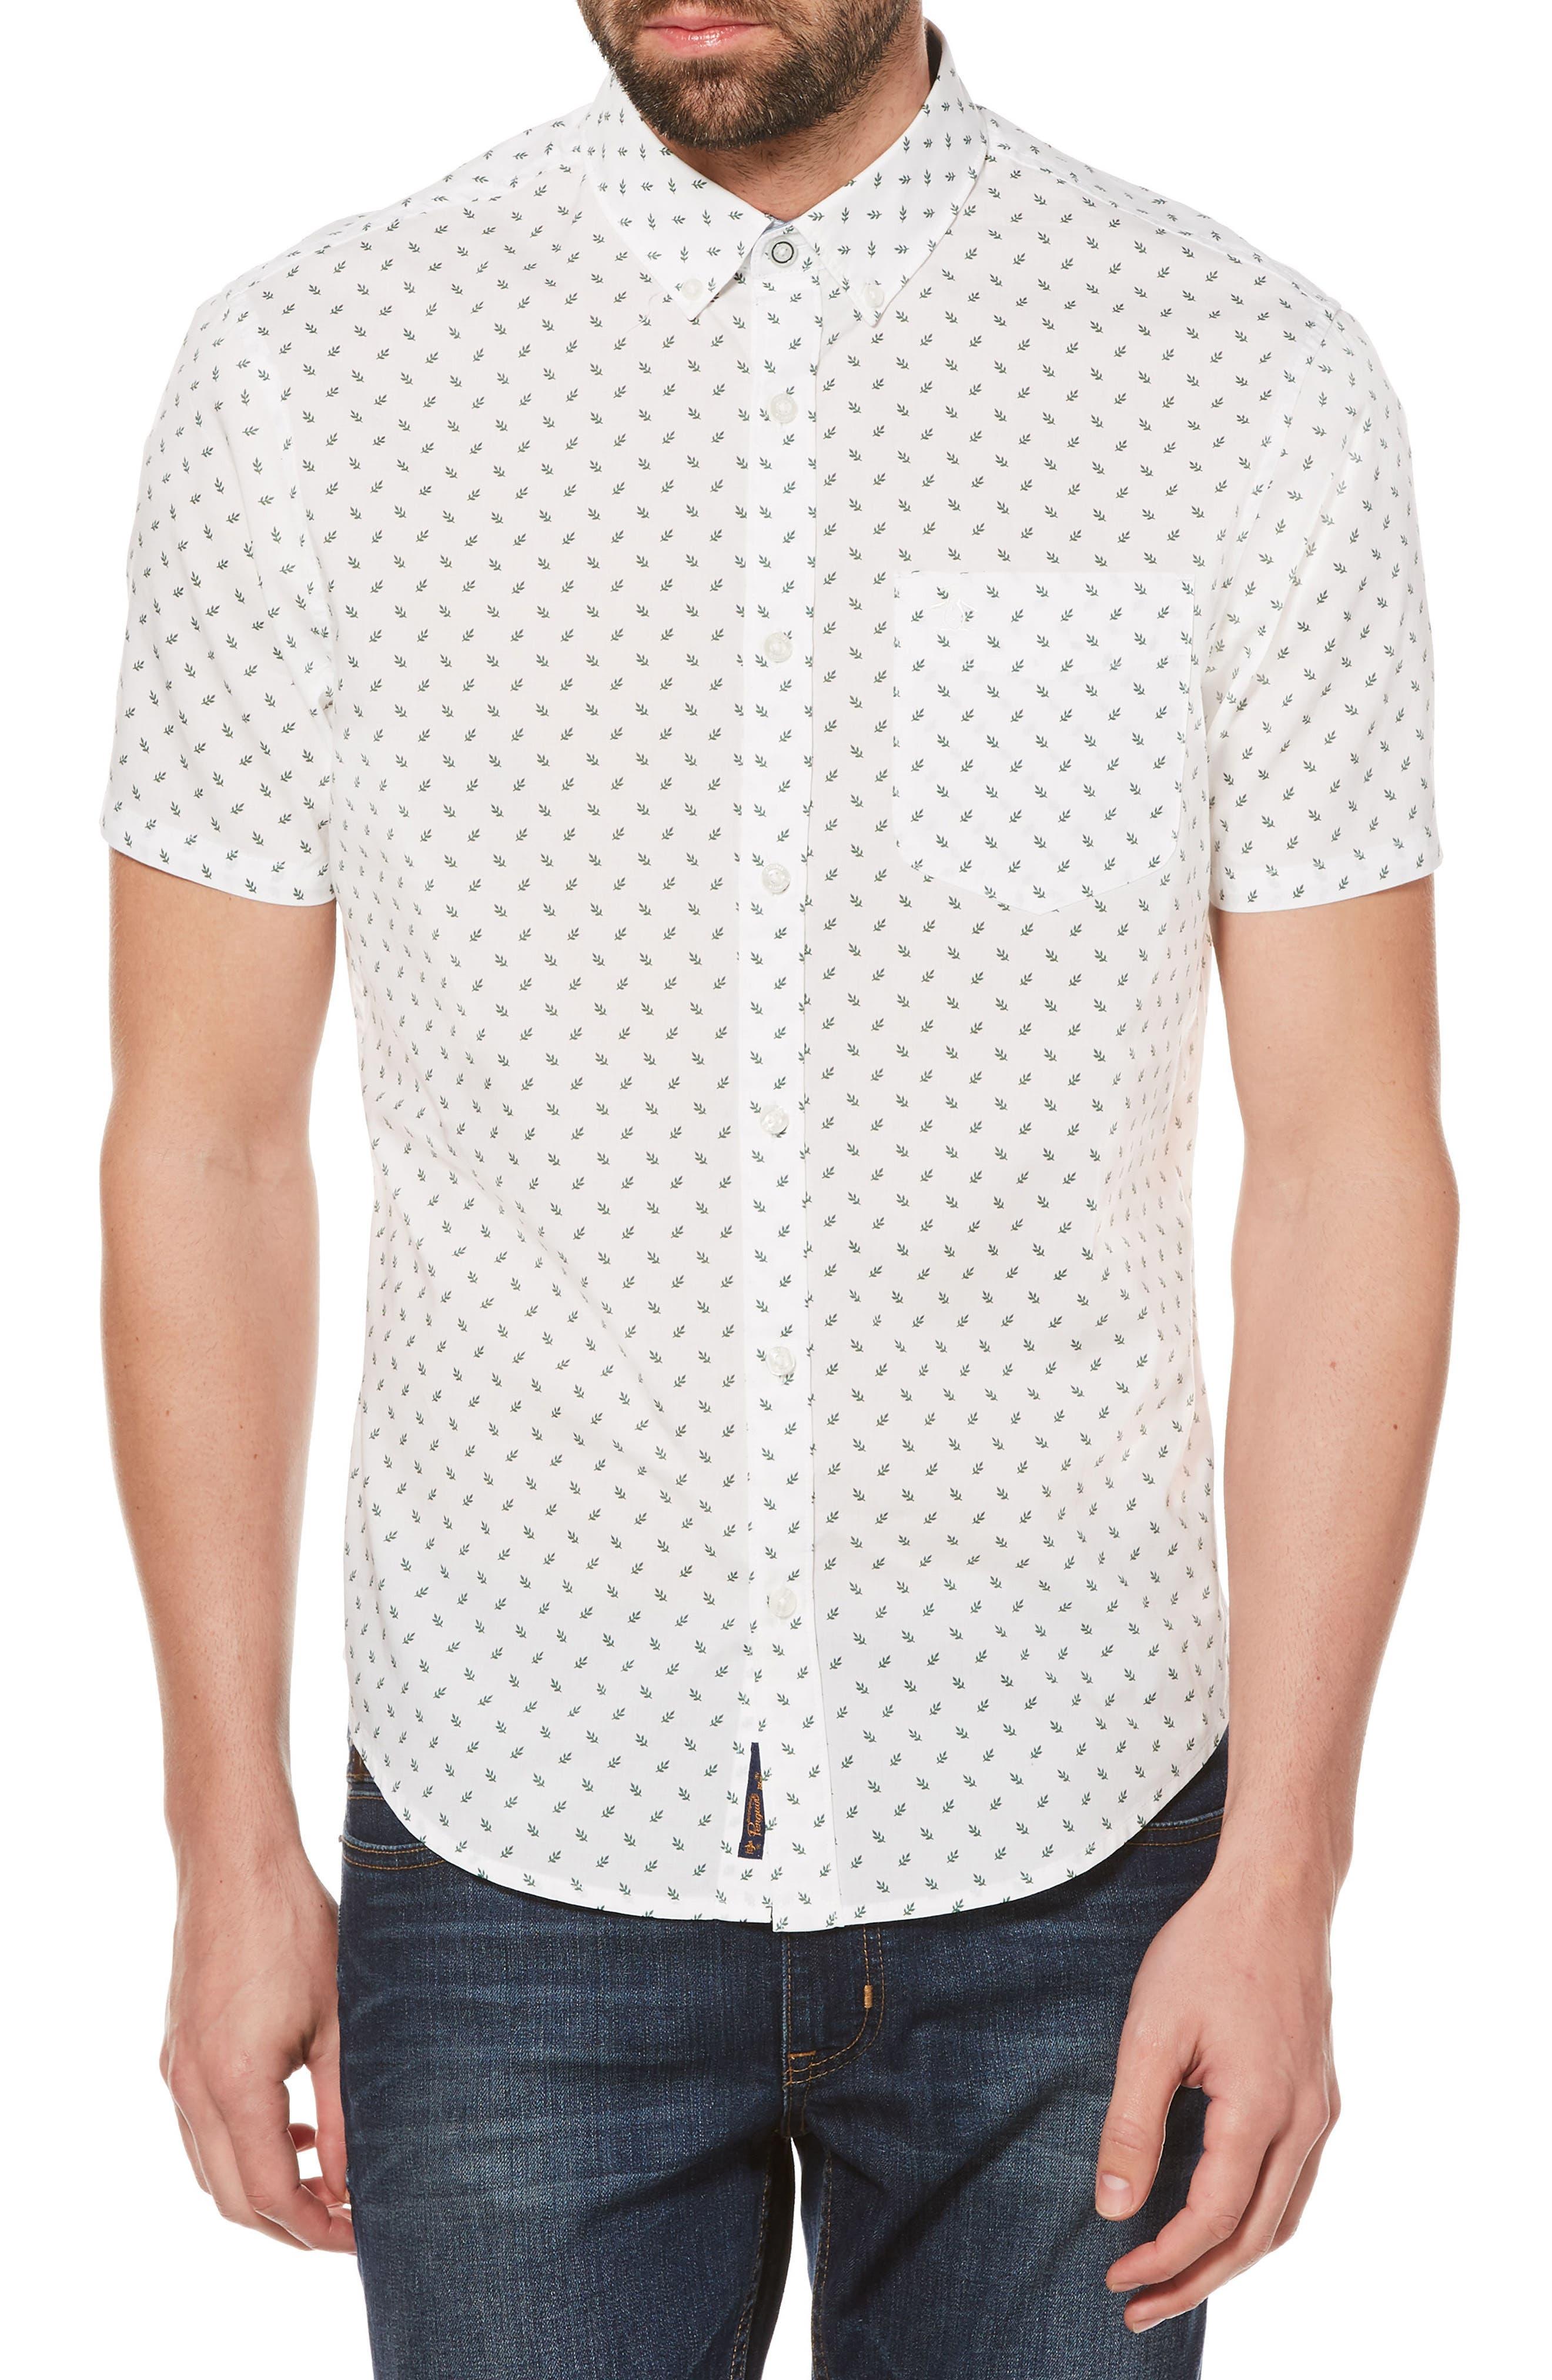 Main Image - Original Penguin Leaf Print Woven Shirt